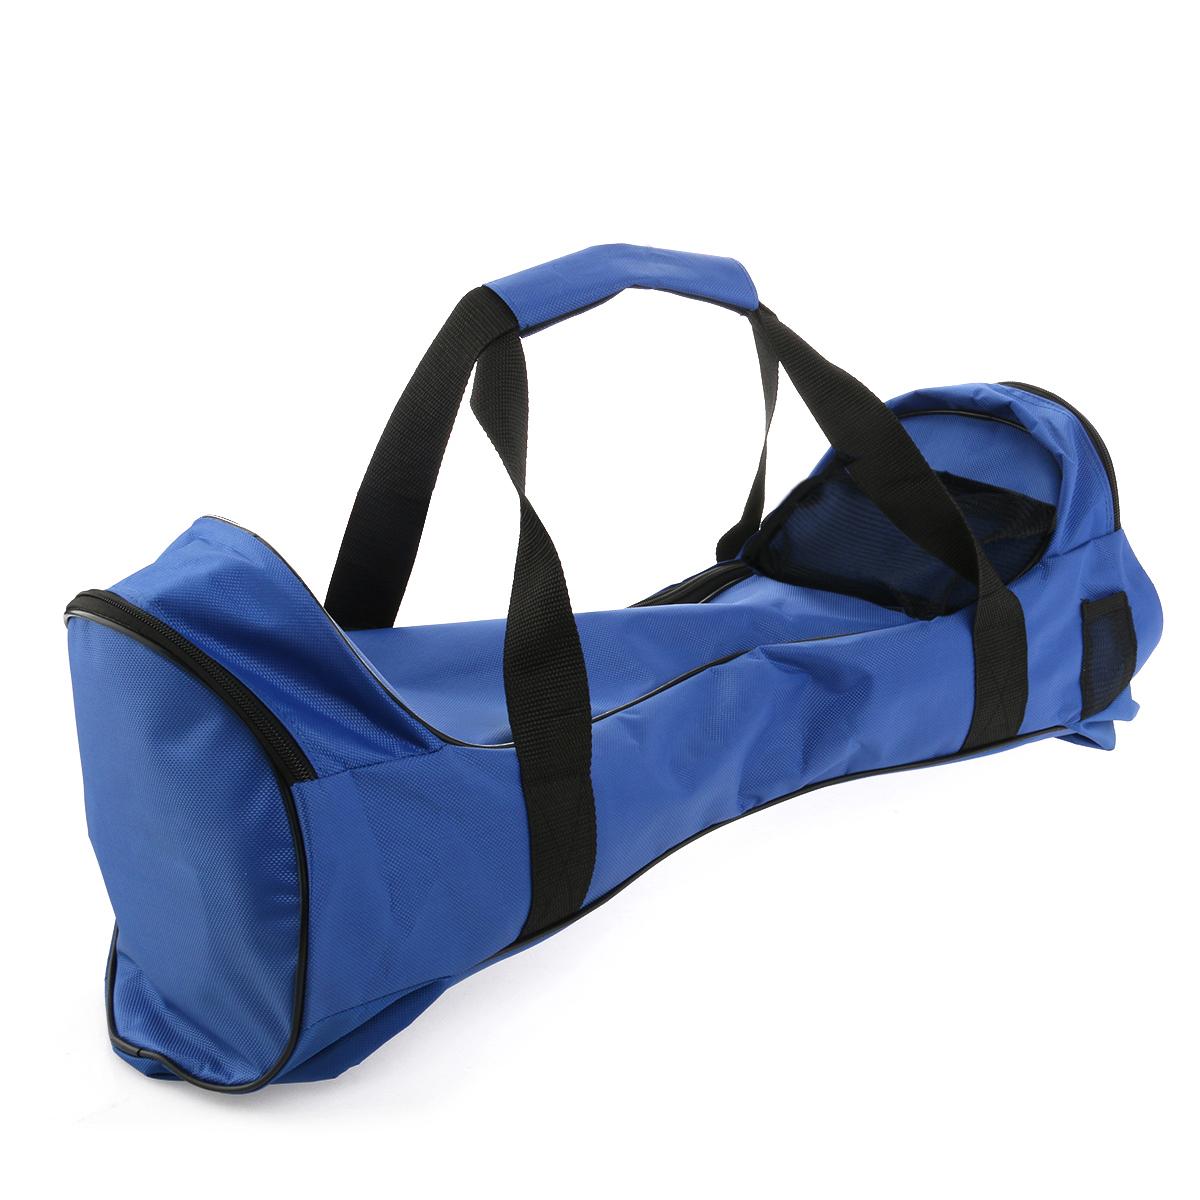 "Portable Carrying Bag Handbag for 6.5/"" Two Wheels Self Balancing Hoverboard"